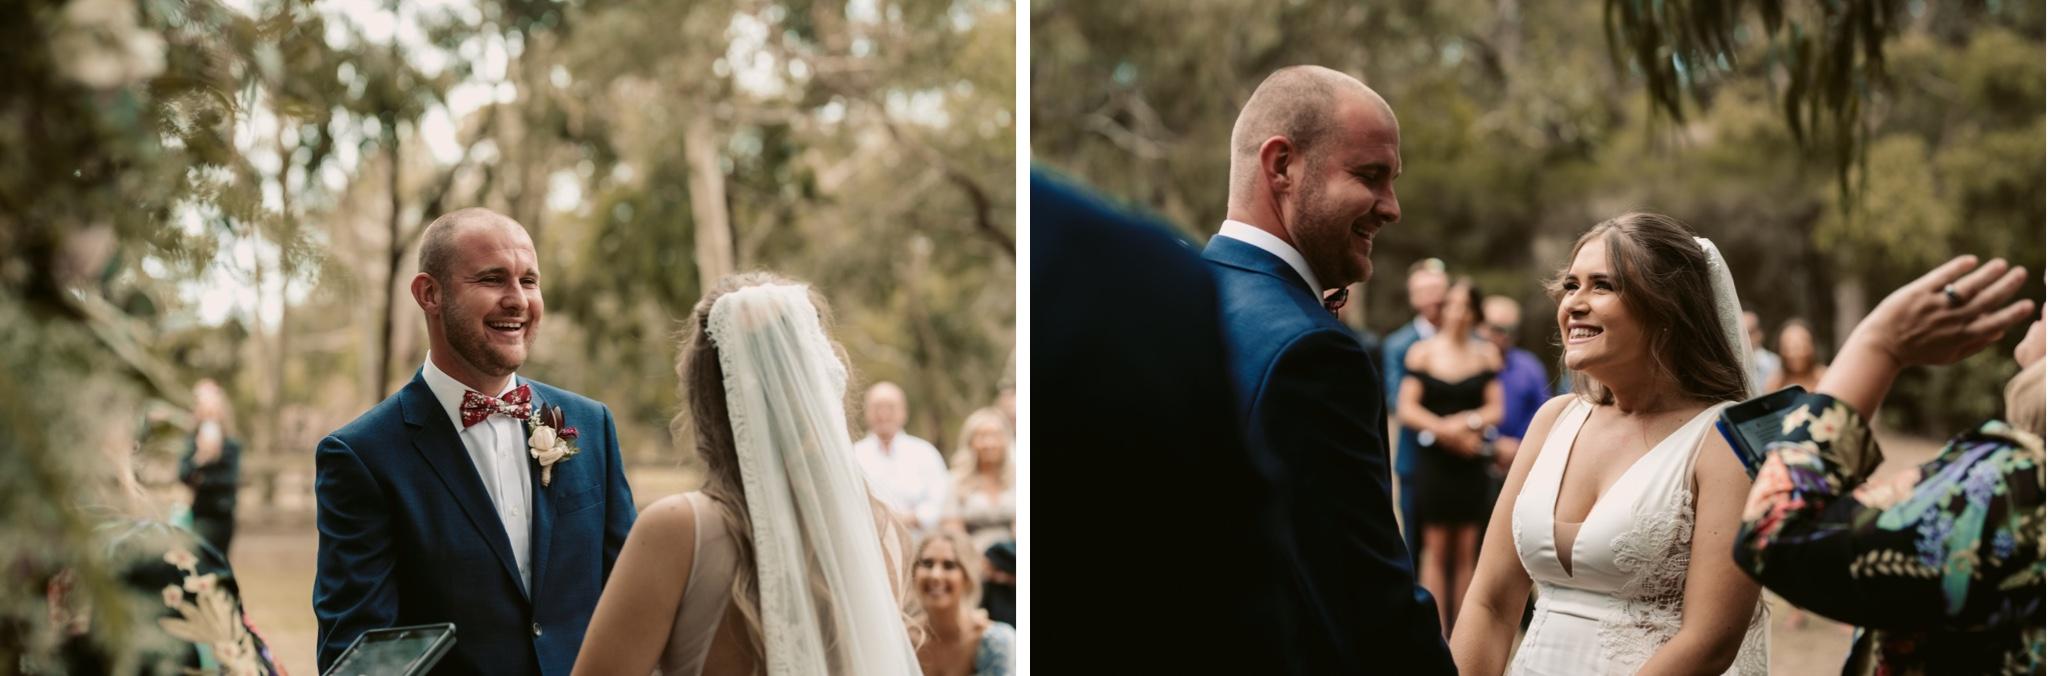 Mornington Peninsula Wedding Photography52.jpg